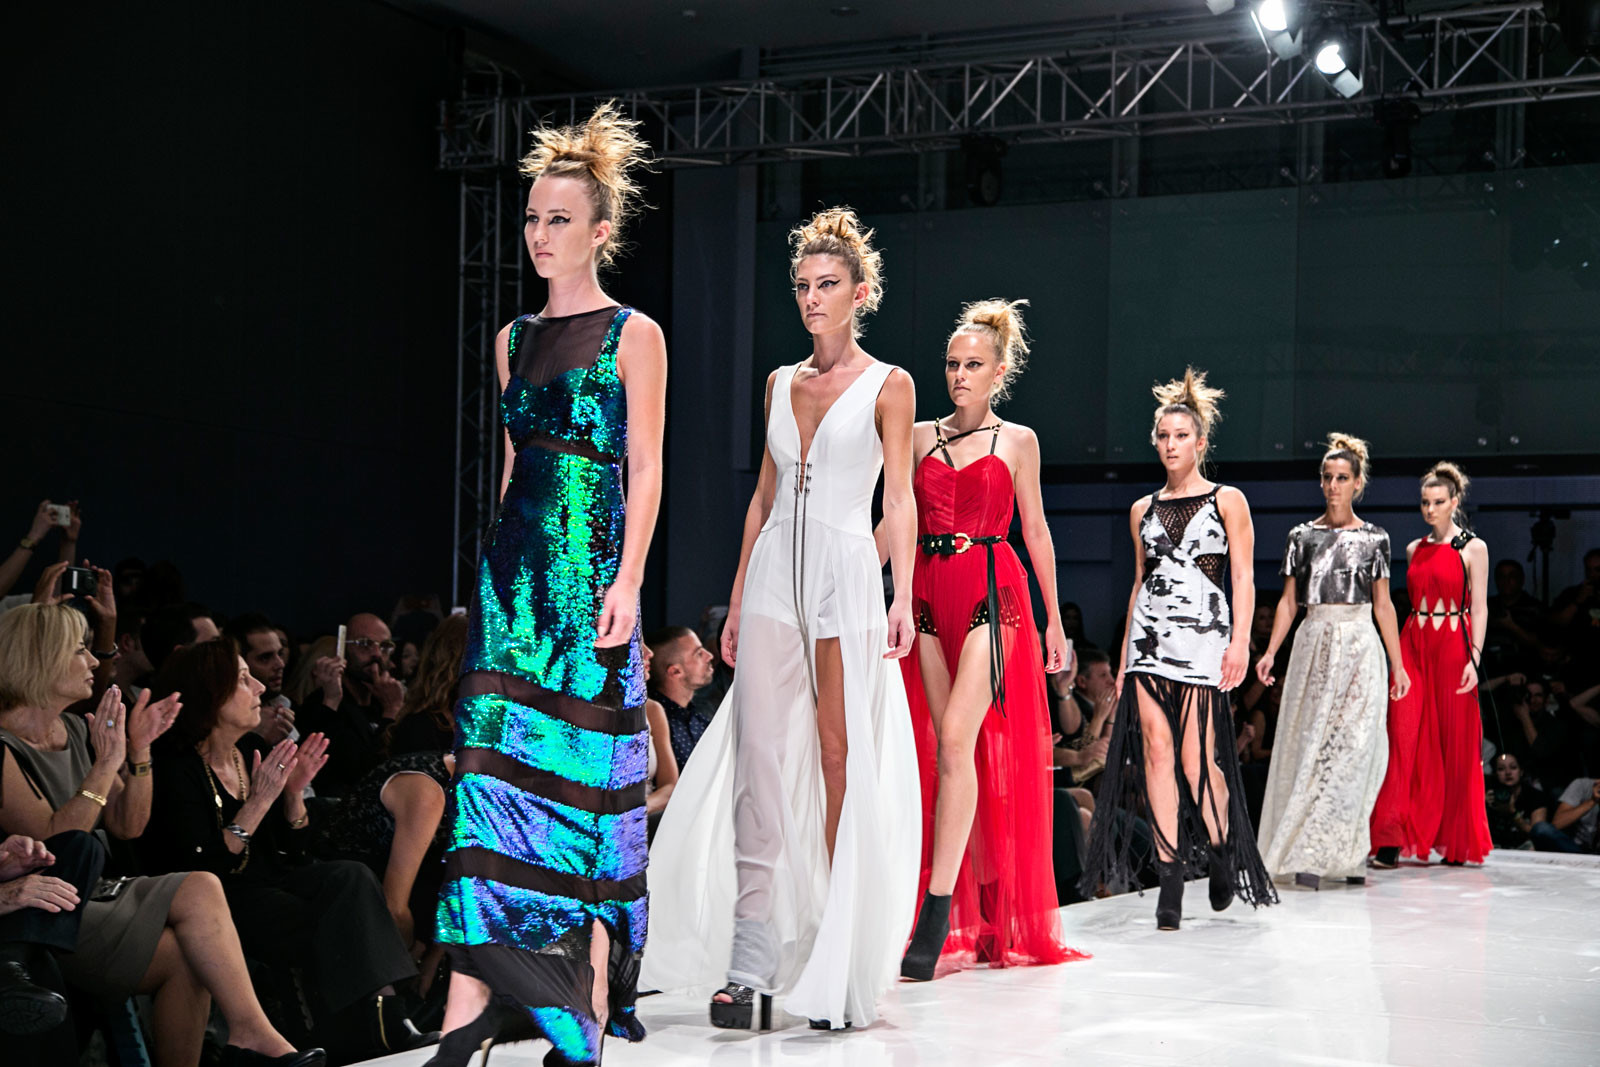 AXDW 2015: Tassos Mitropoulos Fashion Has It..